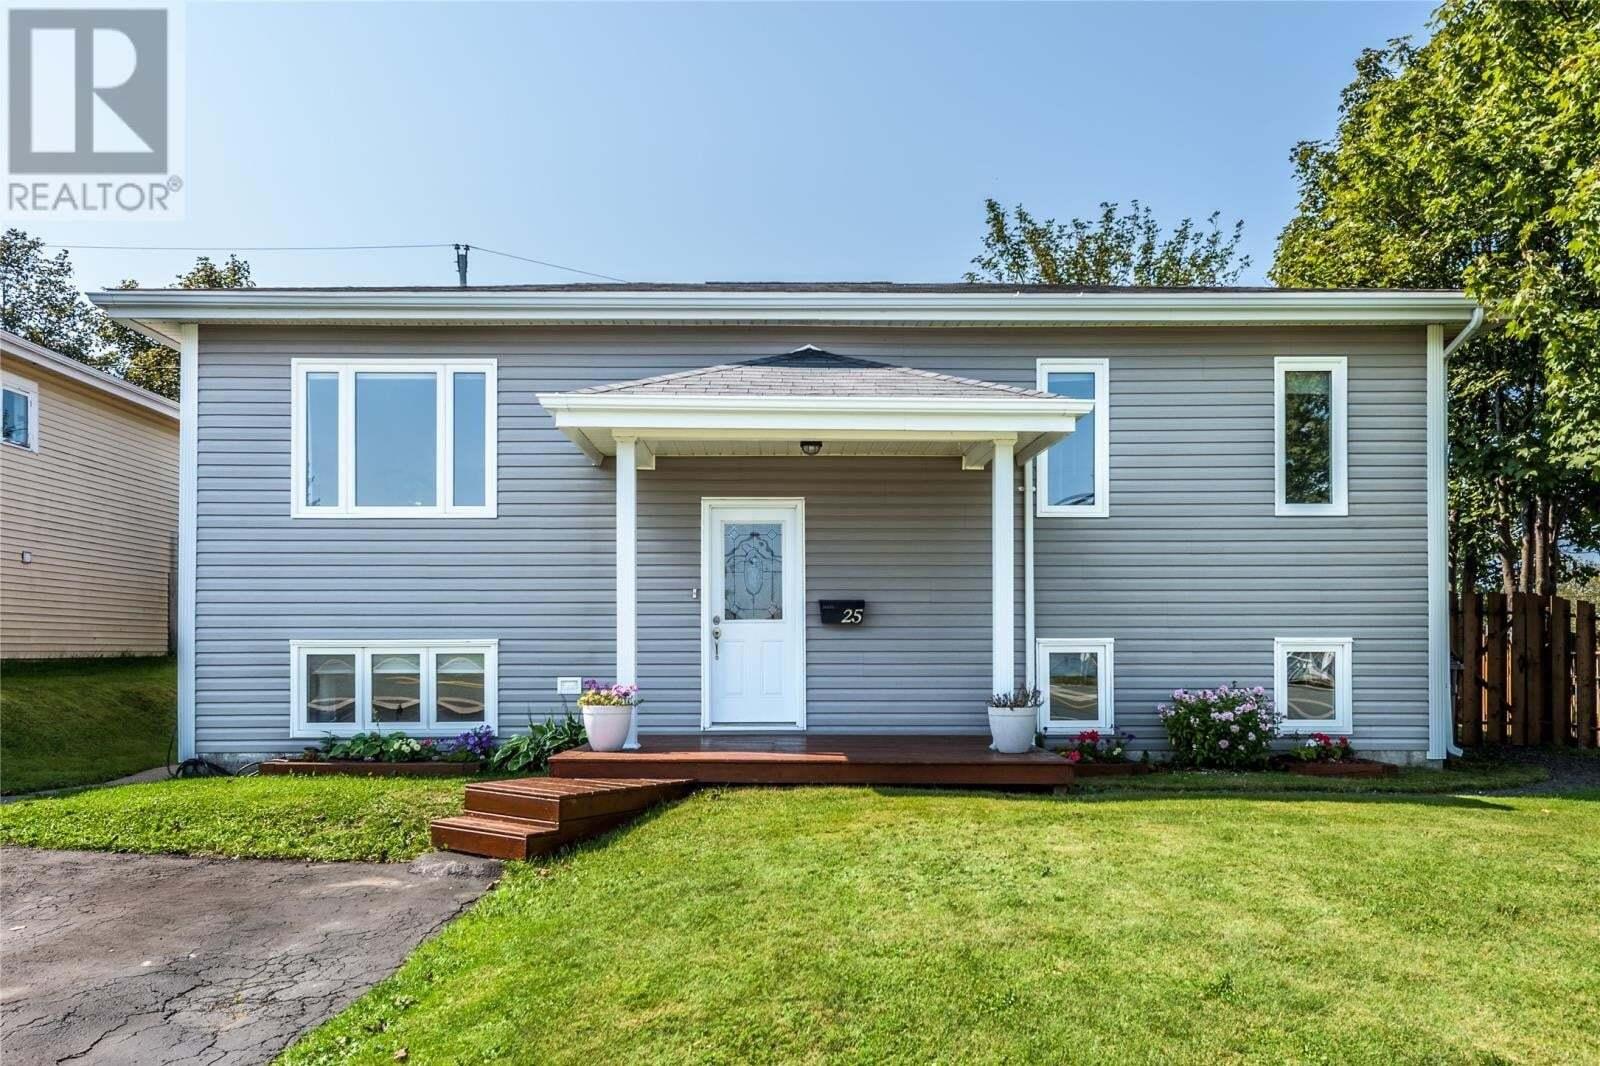 House for sale at 25 Davis Pl Mount Pearl Newfoundland - MLS: 1221221